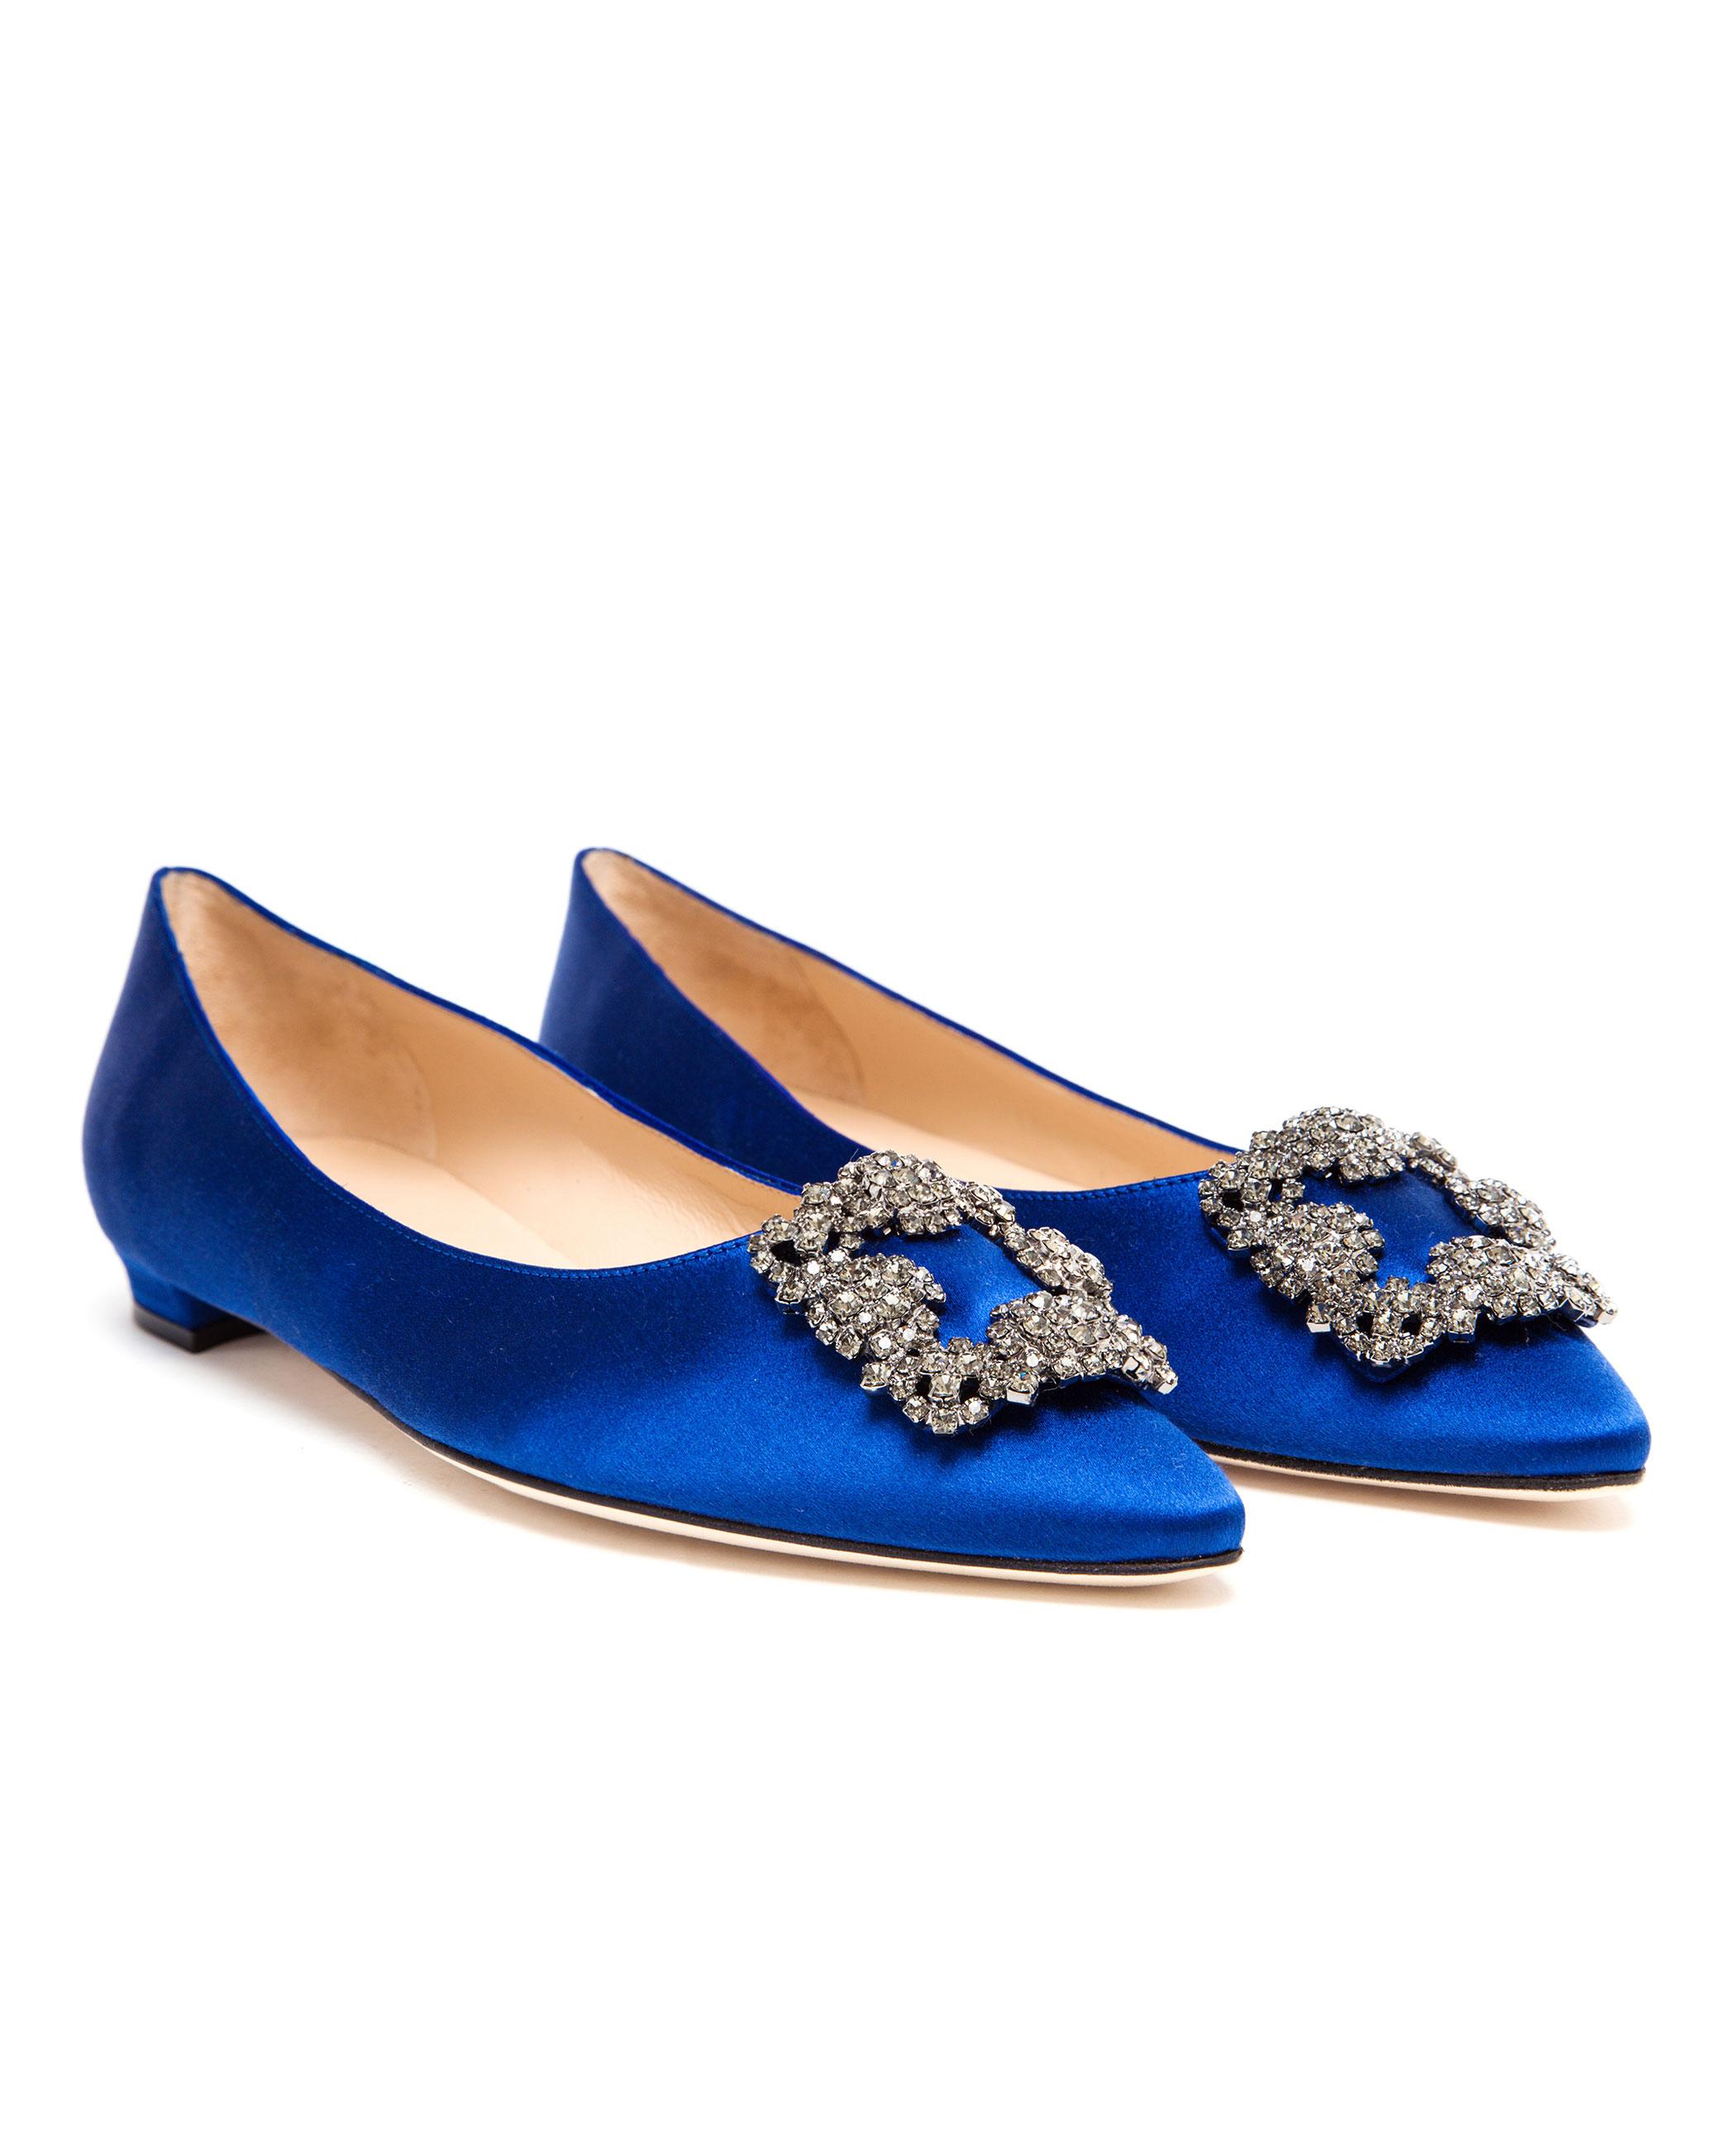 60b4b495d92e free shipping manolo blahnik ballerina shoes fc300 f034d  50% off manolo  blahnik hangisi embellished satin flats in blue lyst 790e3 f645c